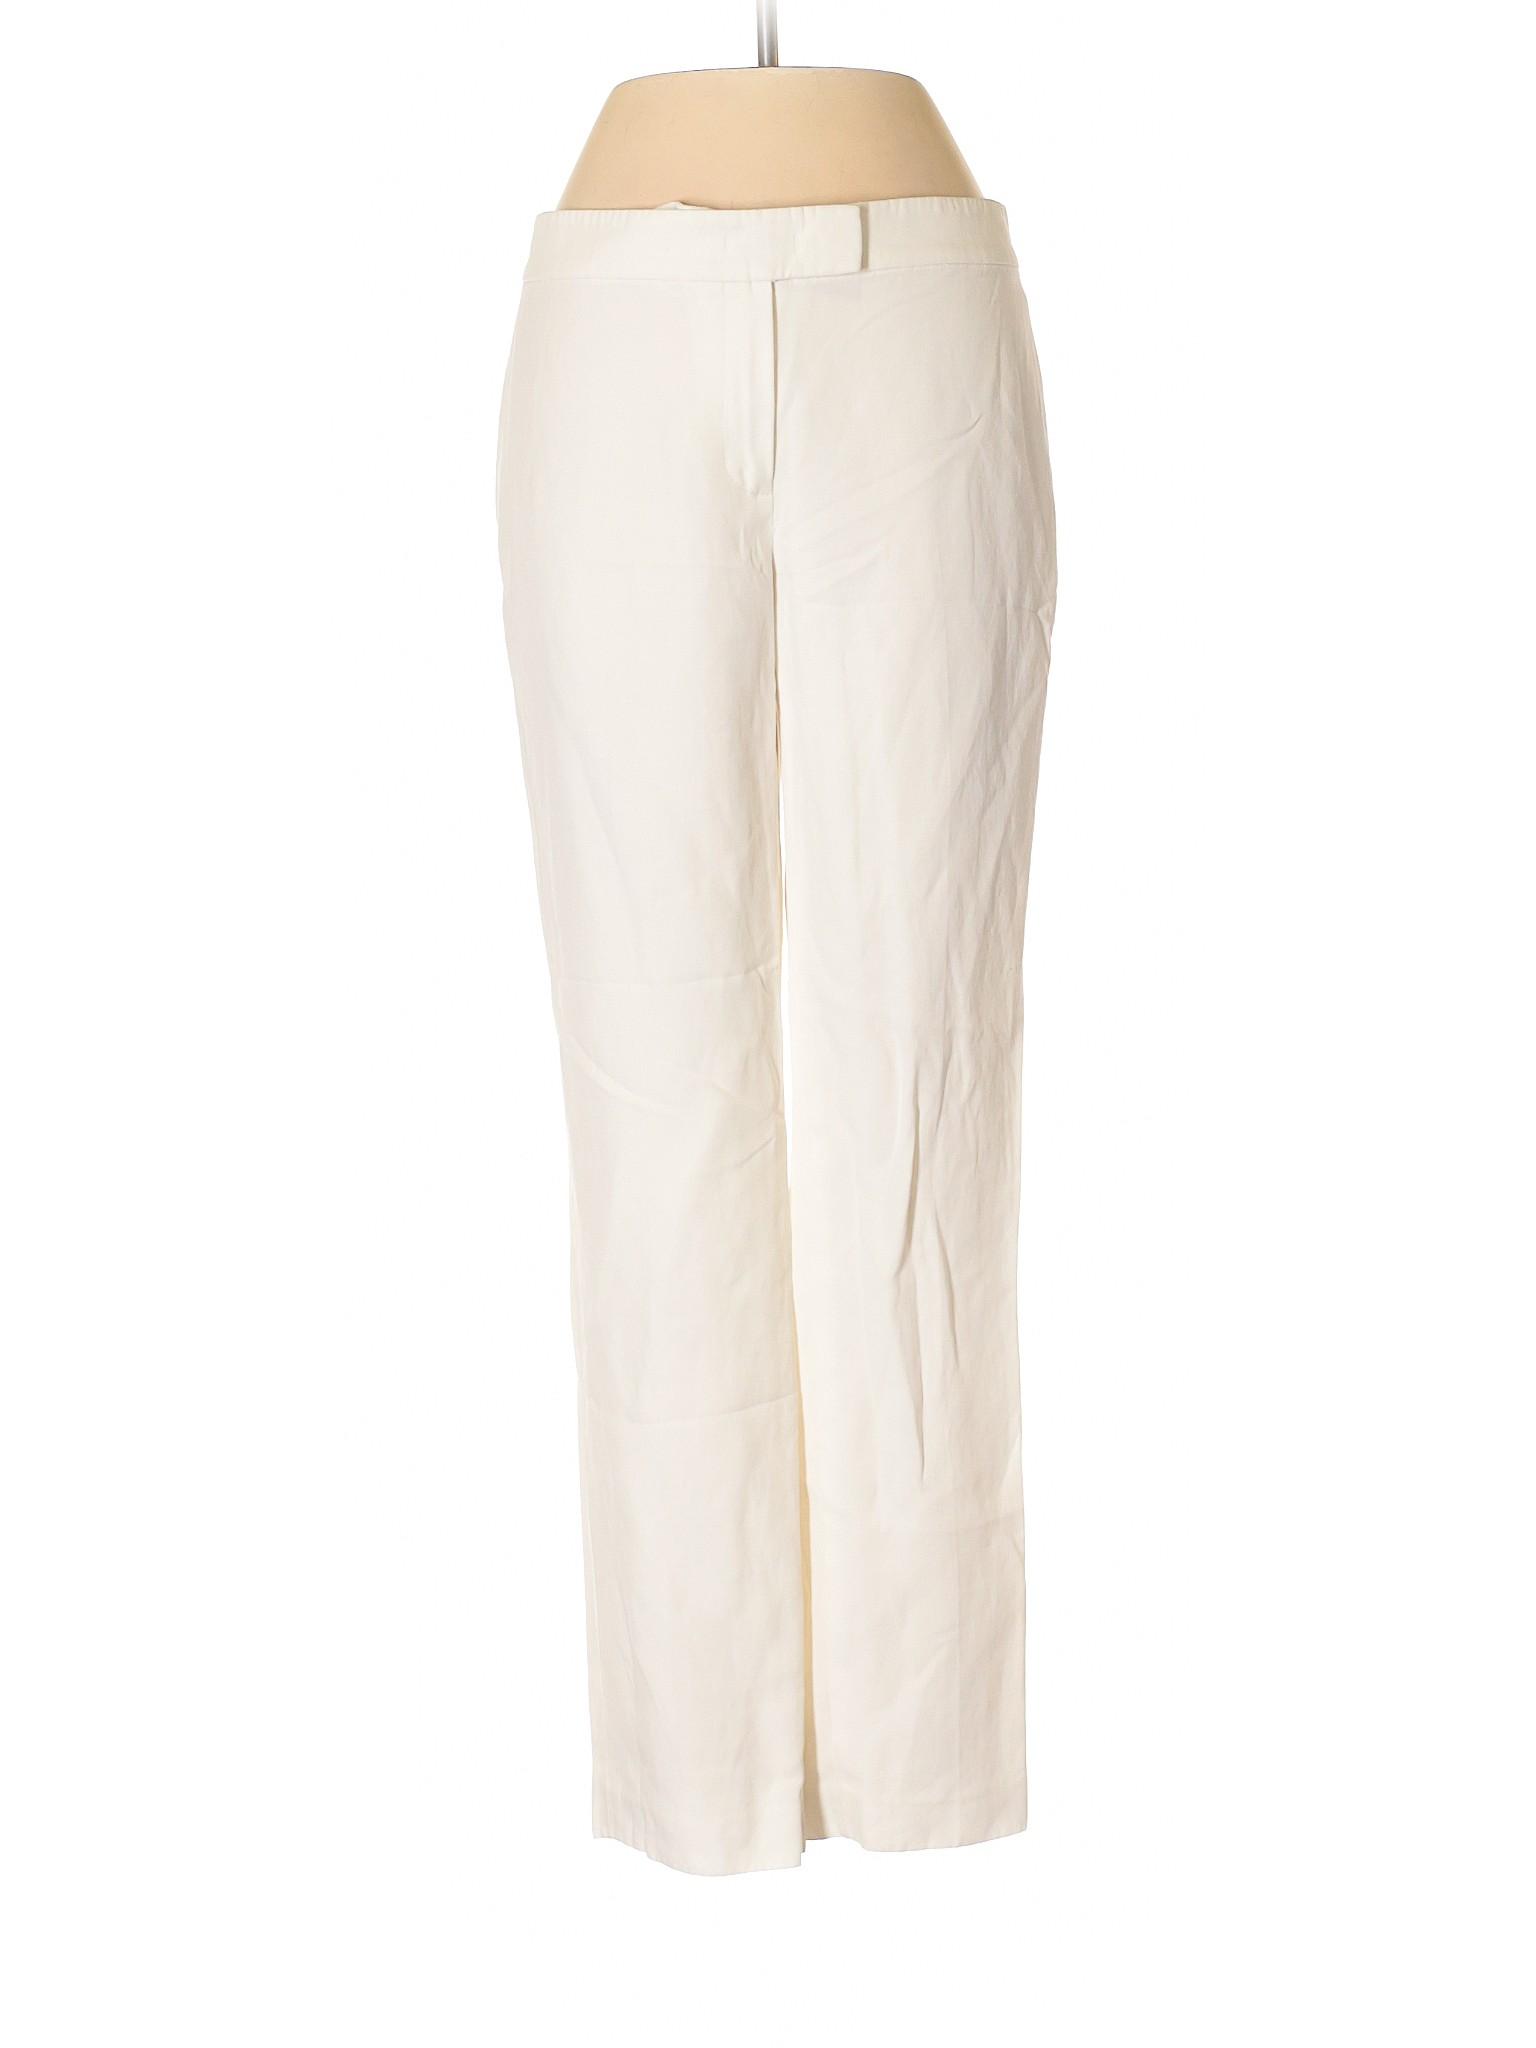 Dress Klein Pants Boutique Anne leisure gPxfYw8